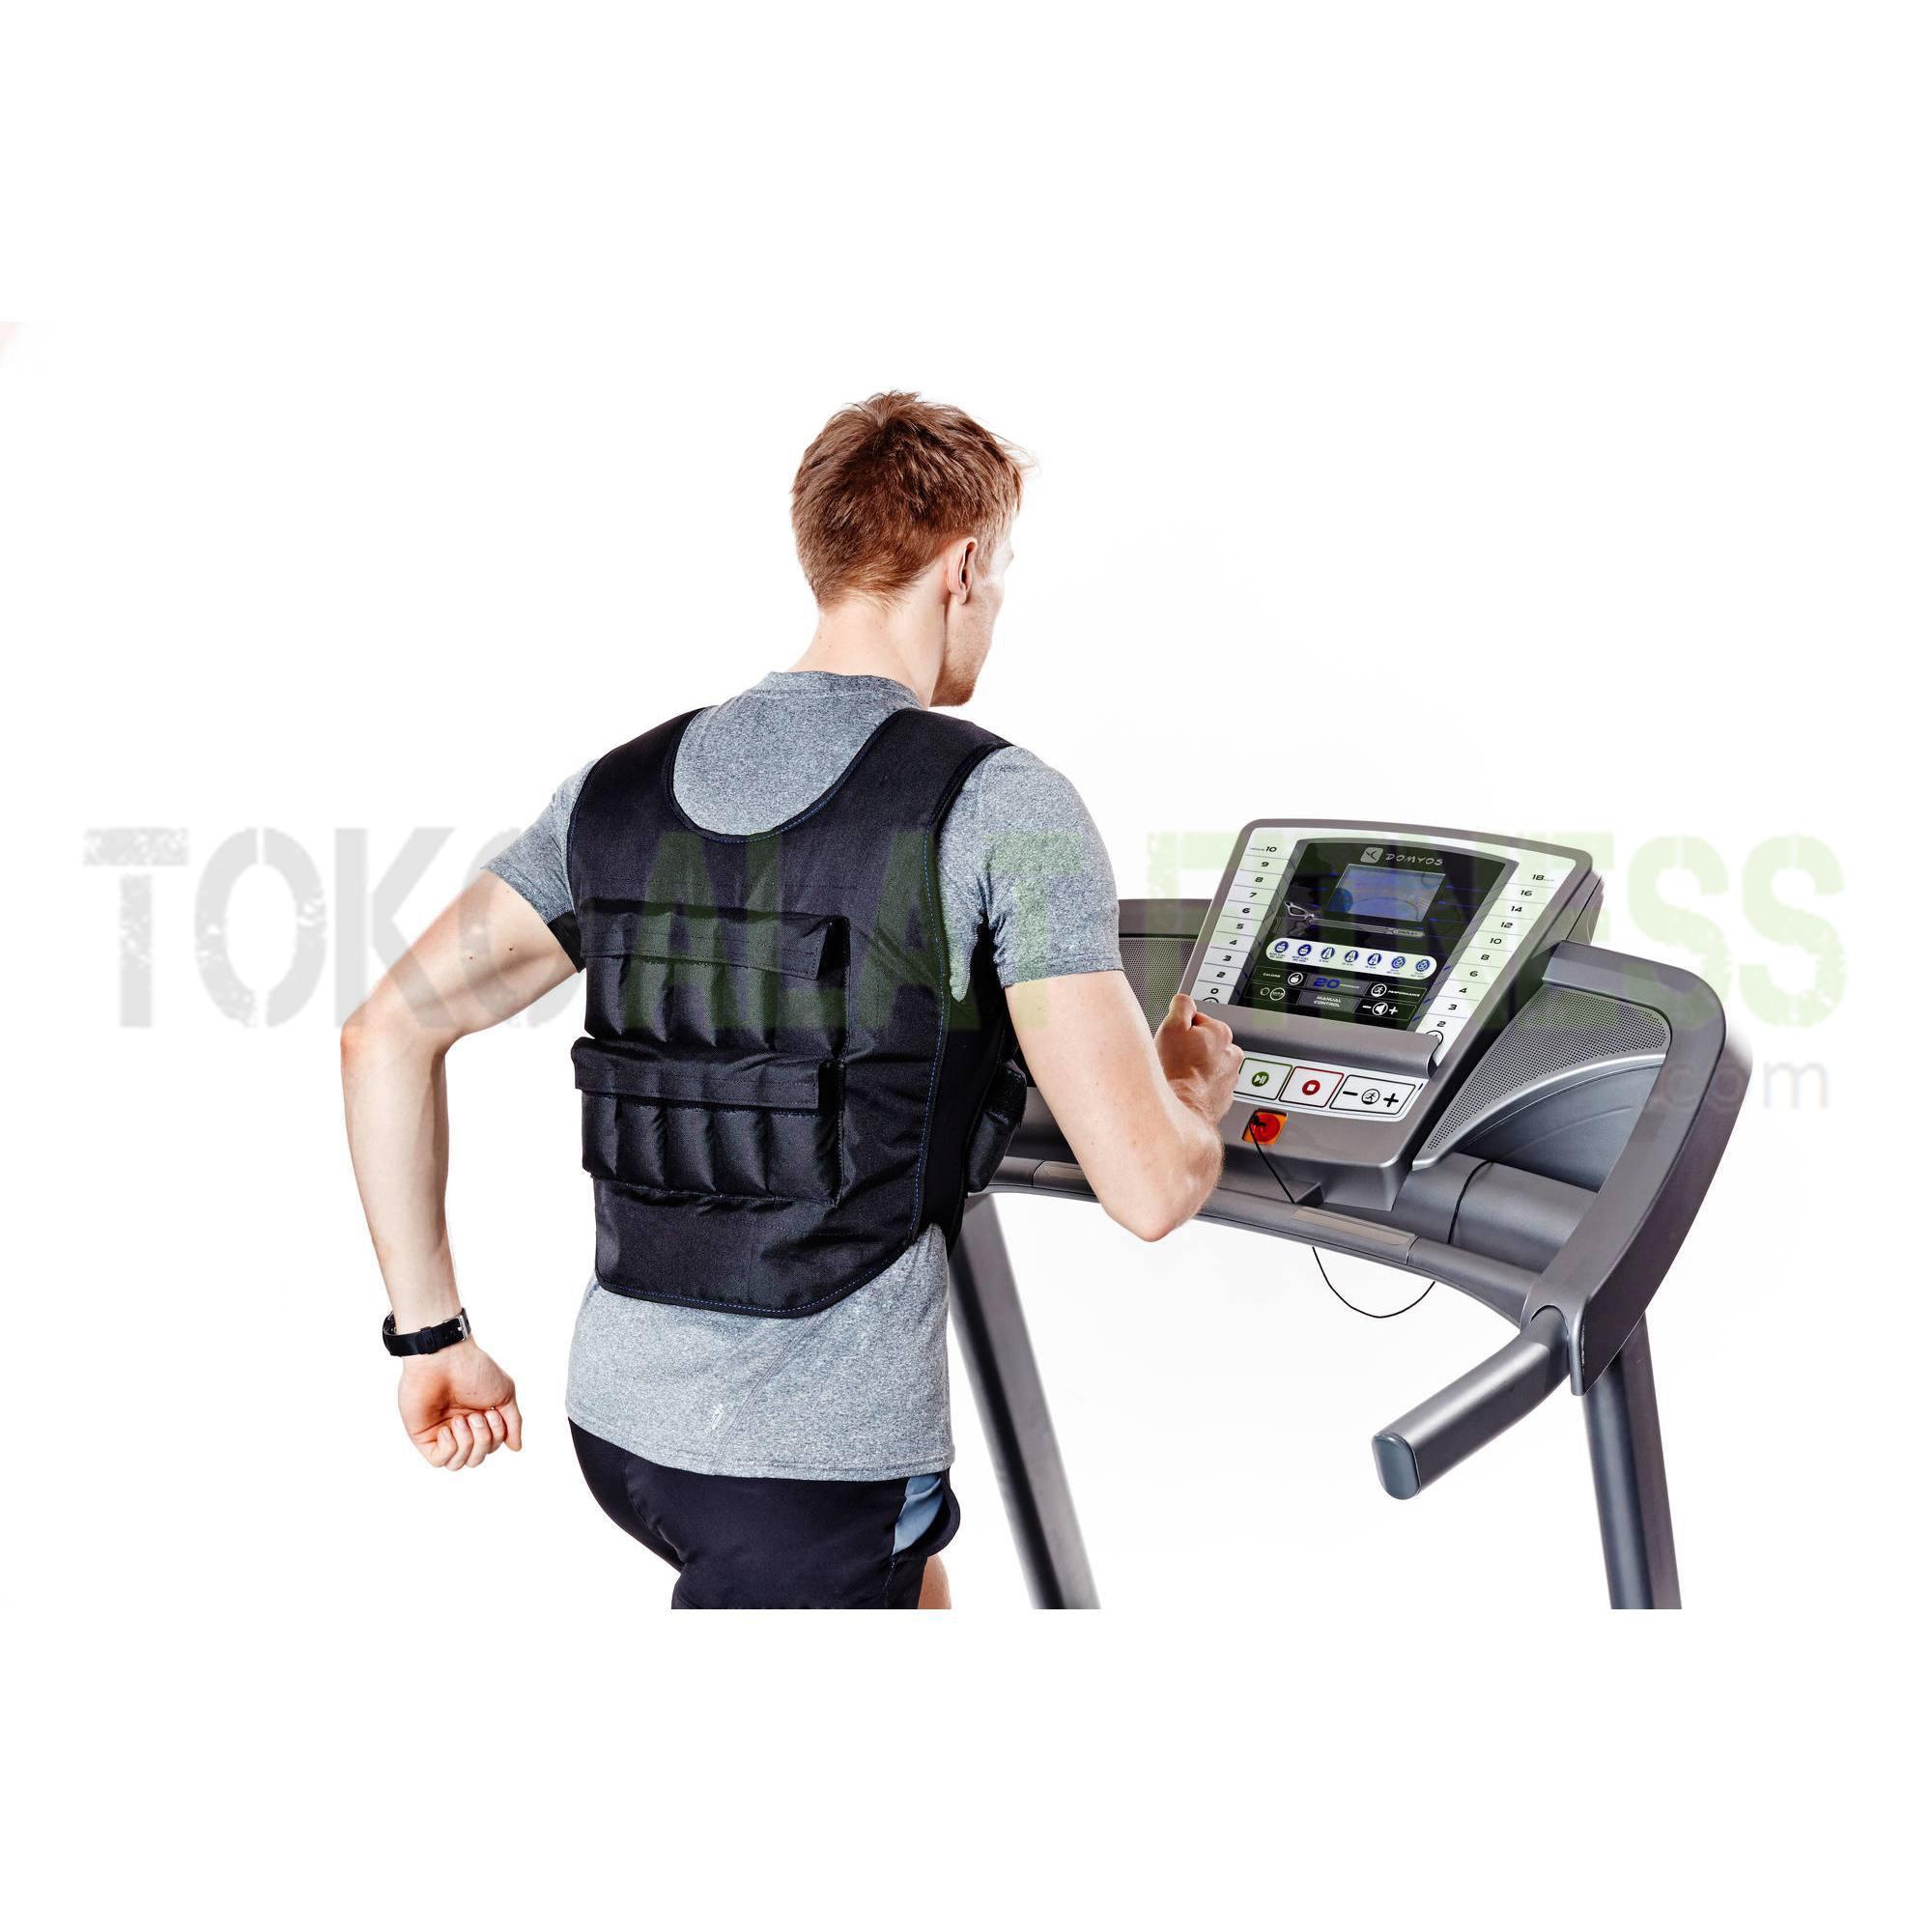 rompi pemberat domyos wtm 8 - Weight Vest/Rompi Pemberat 10kg Domyos - ASSAW39